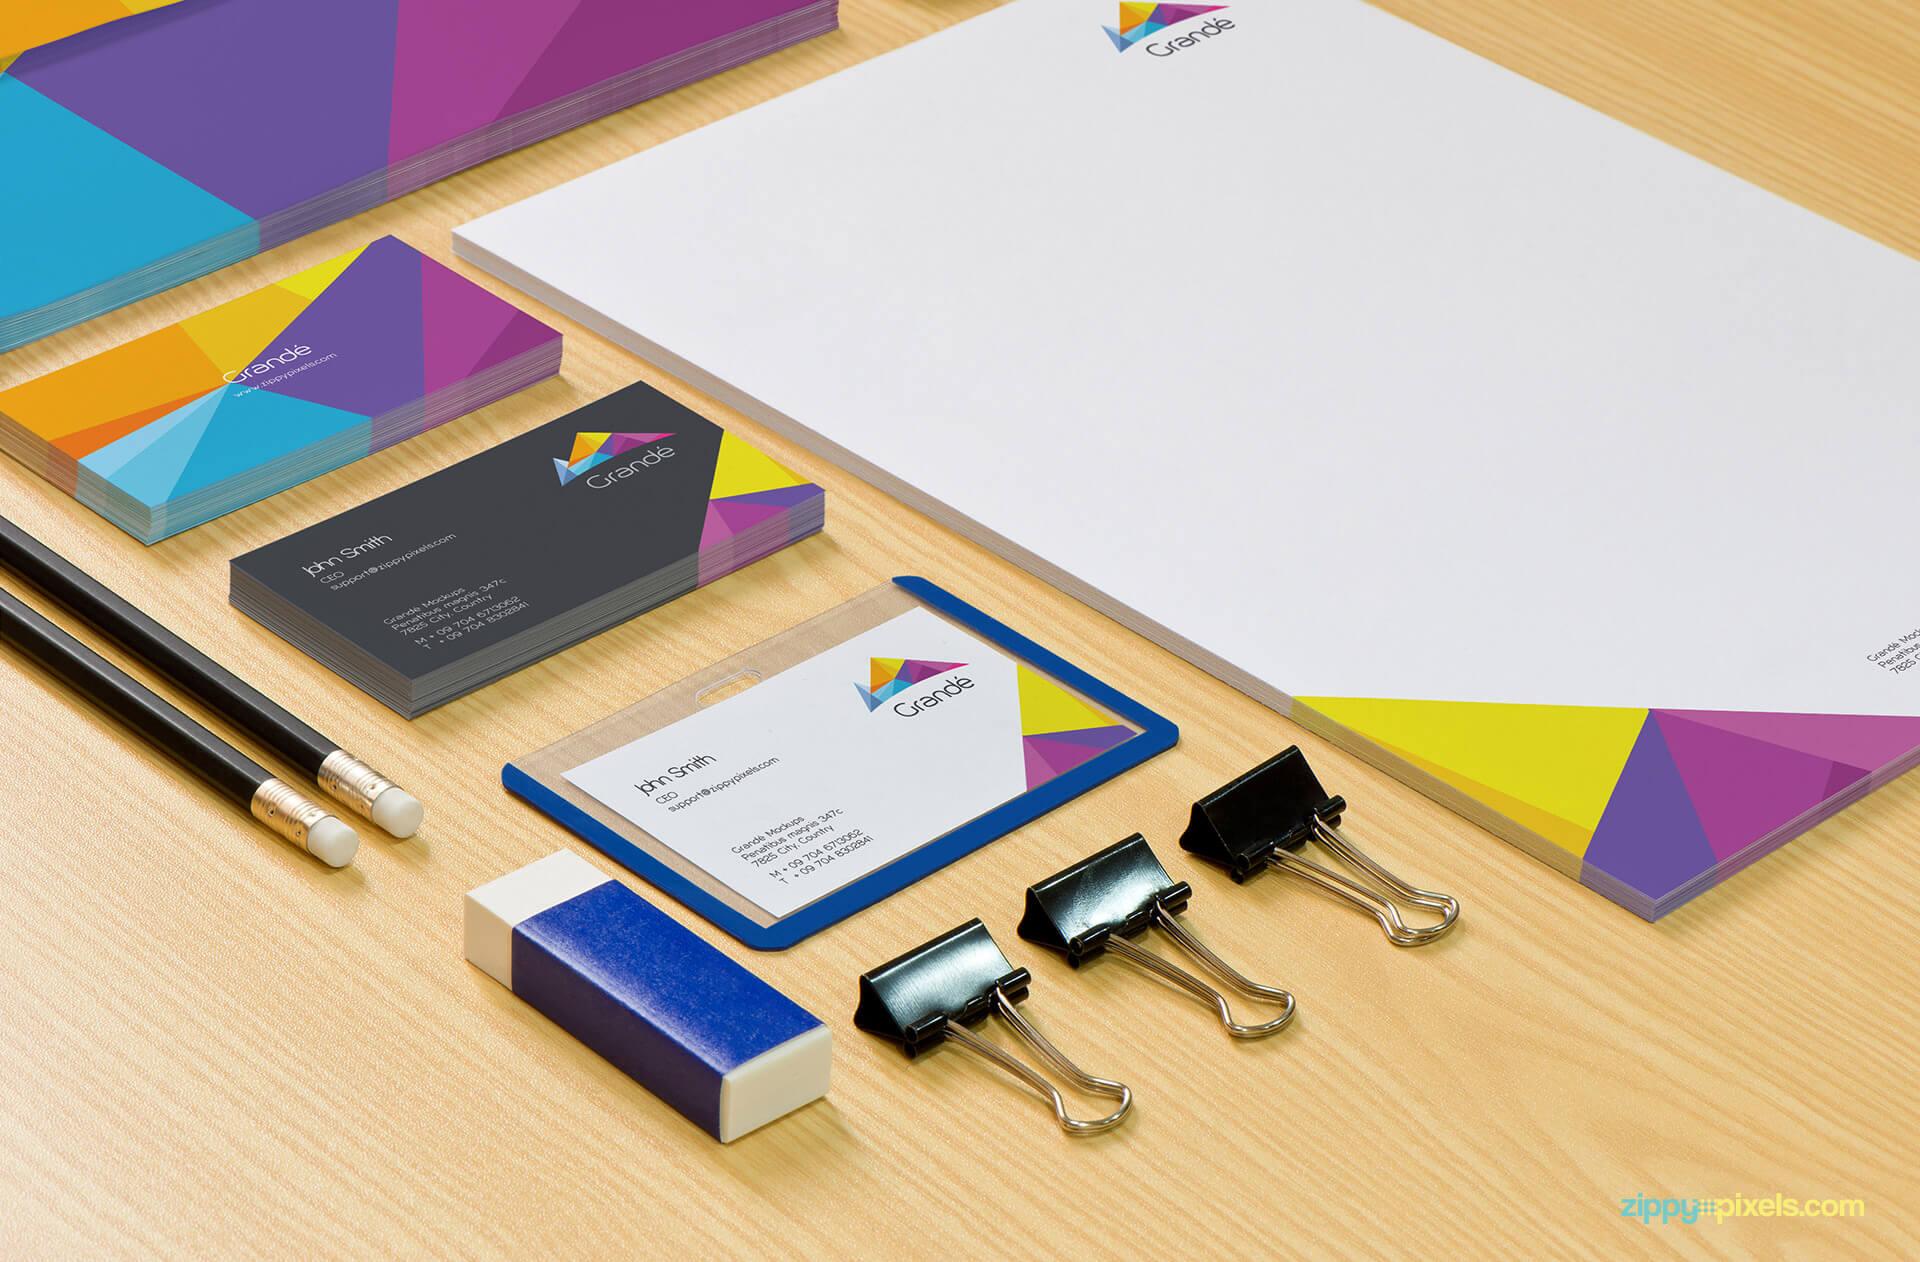 Branding Mockup of Stationery Items like Badge holder, Letterhead, Business Cards